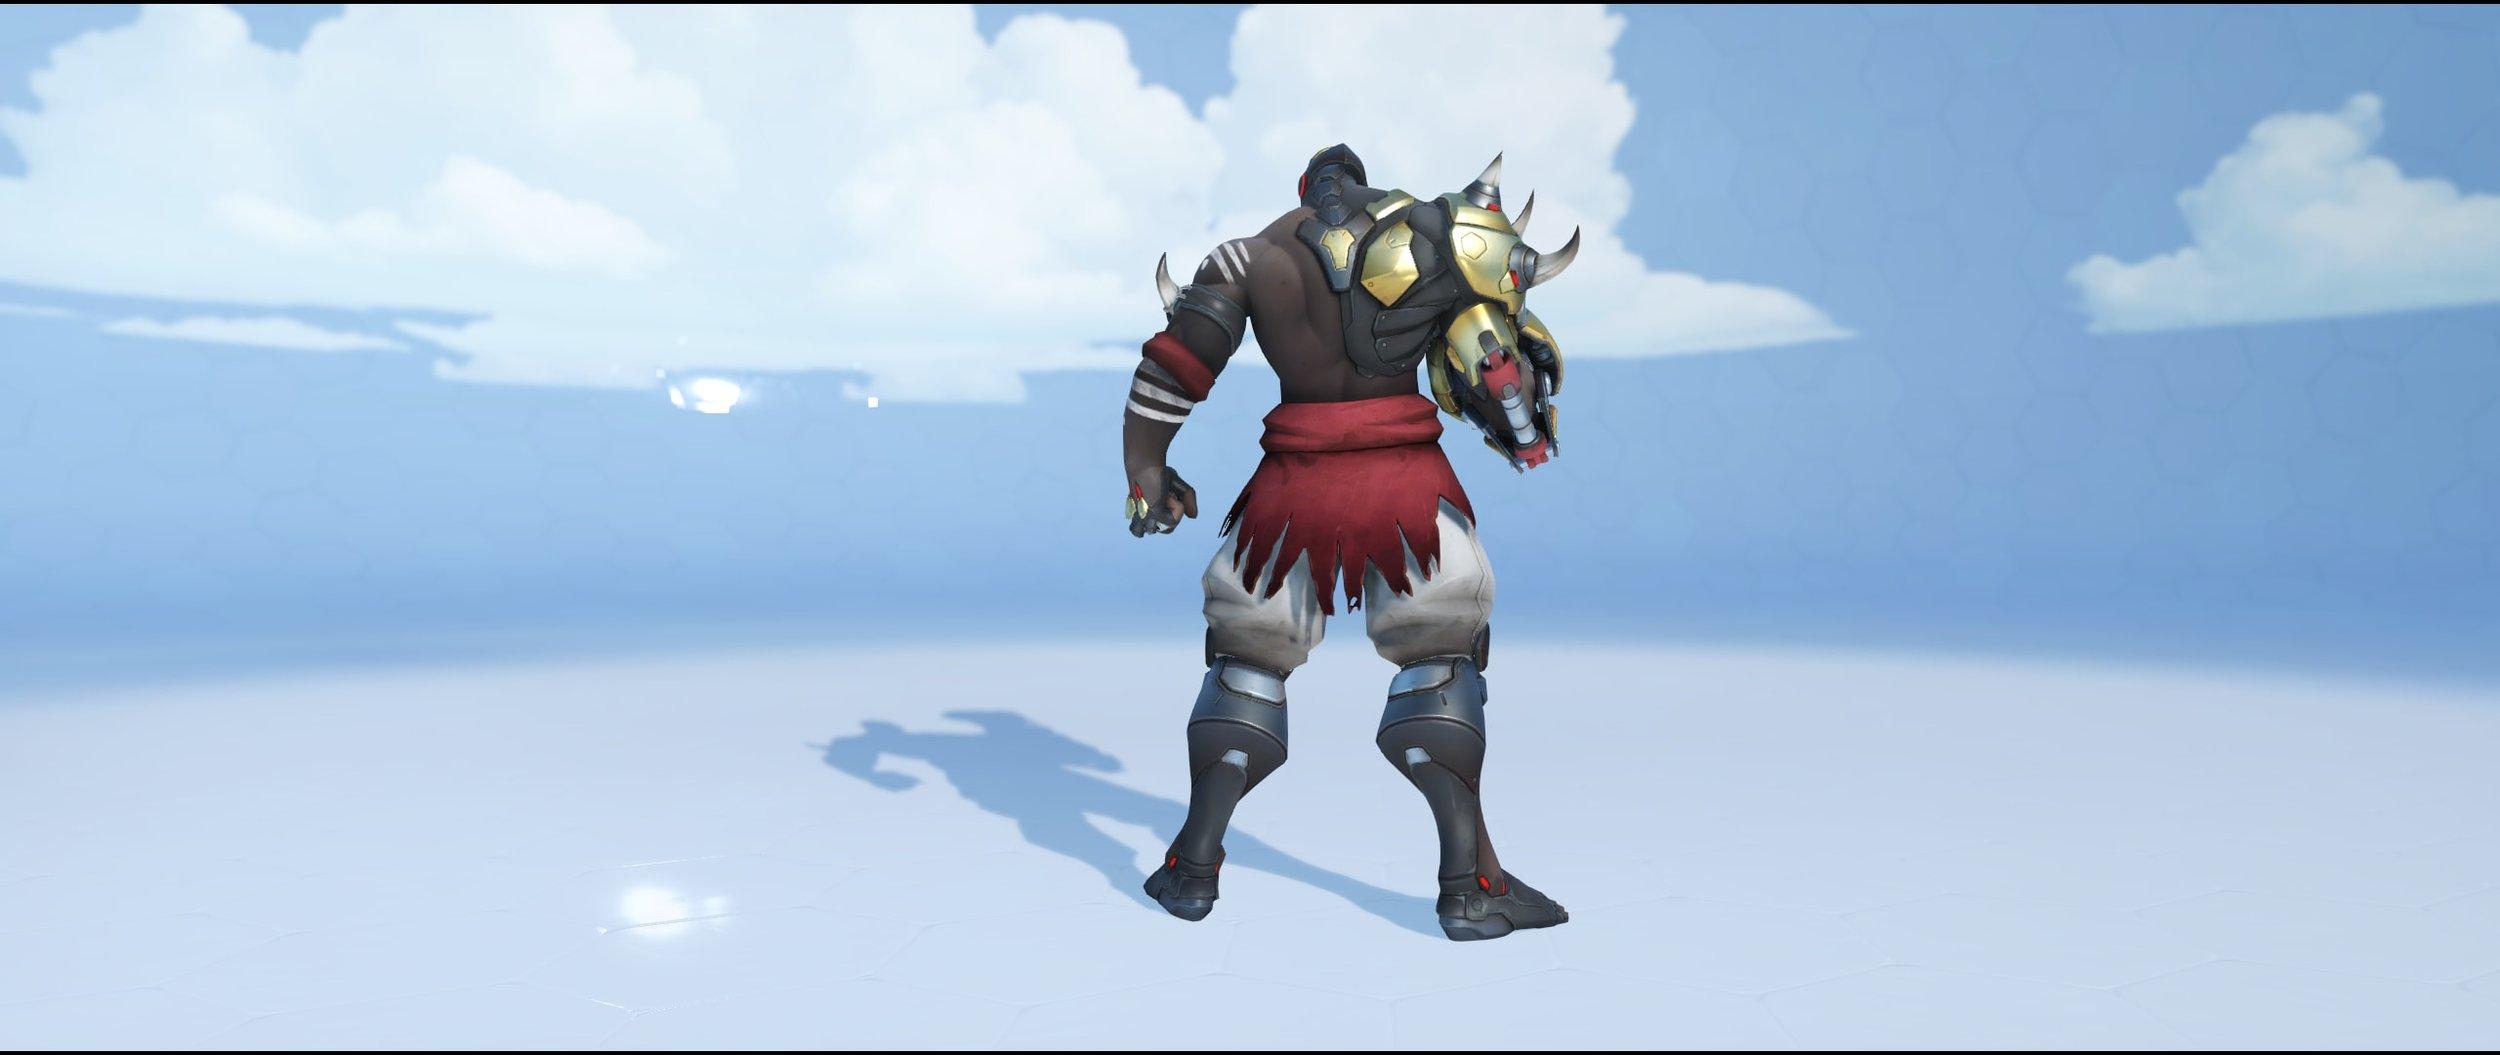 Classic back common skin Doomfist Overwatch.jpg